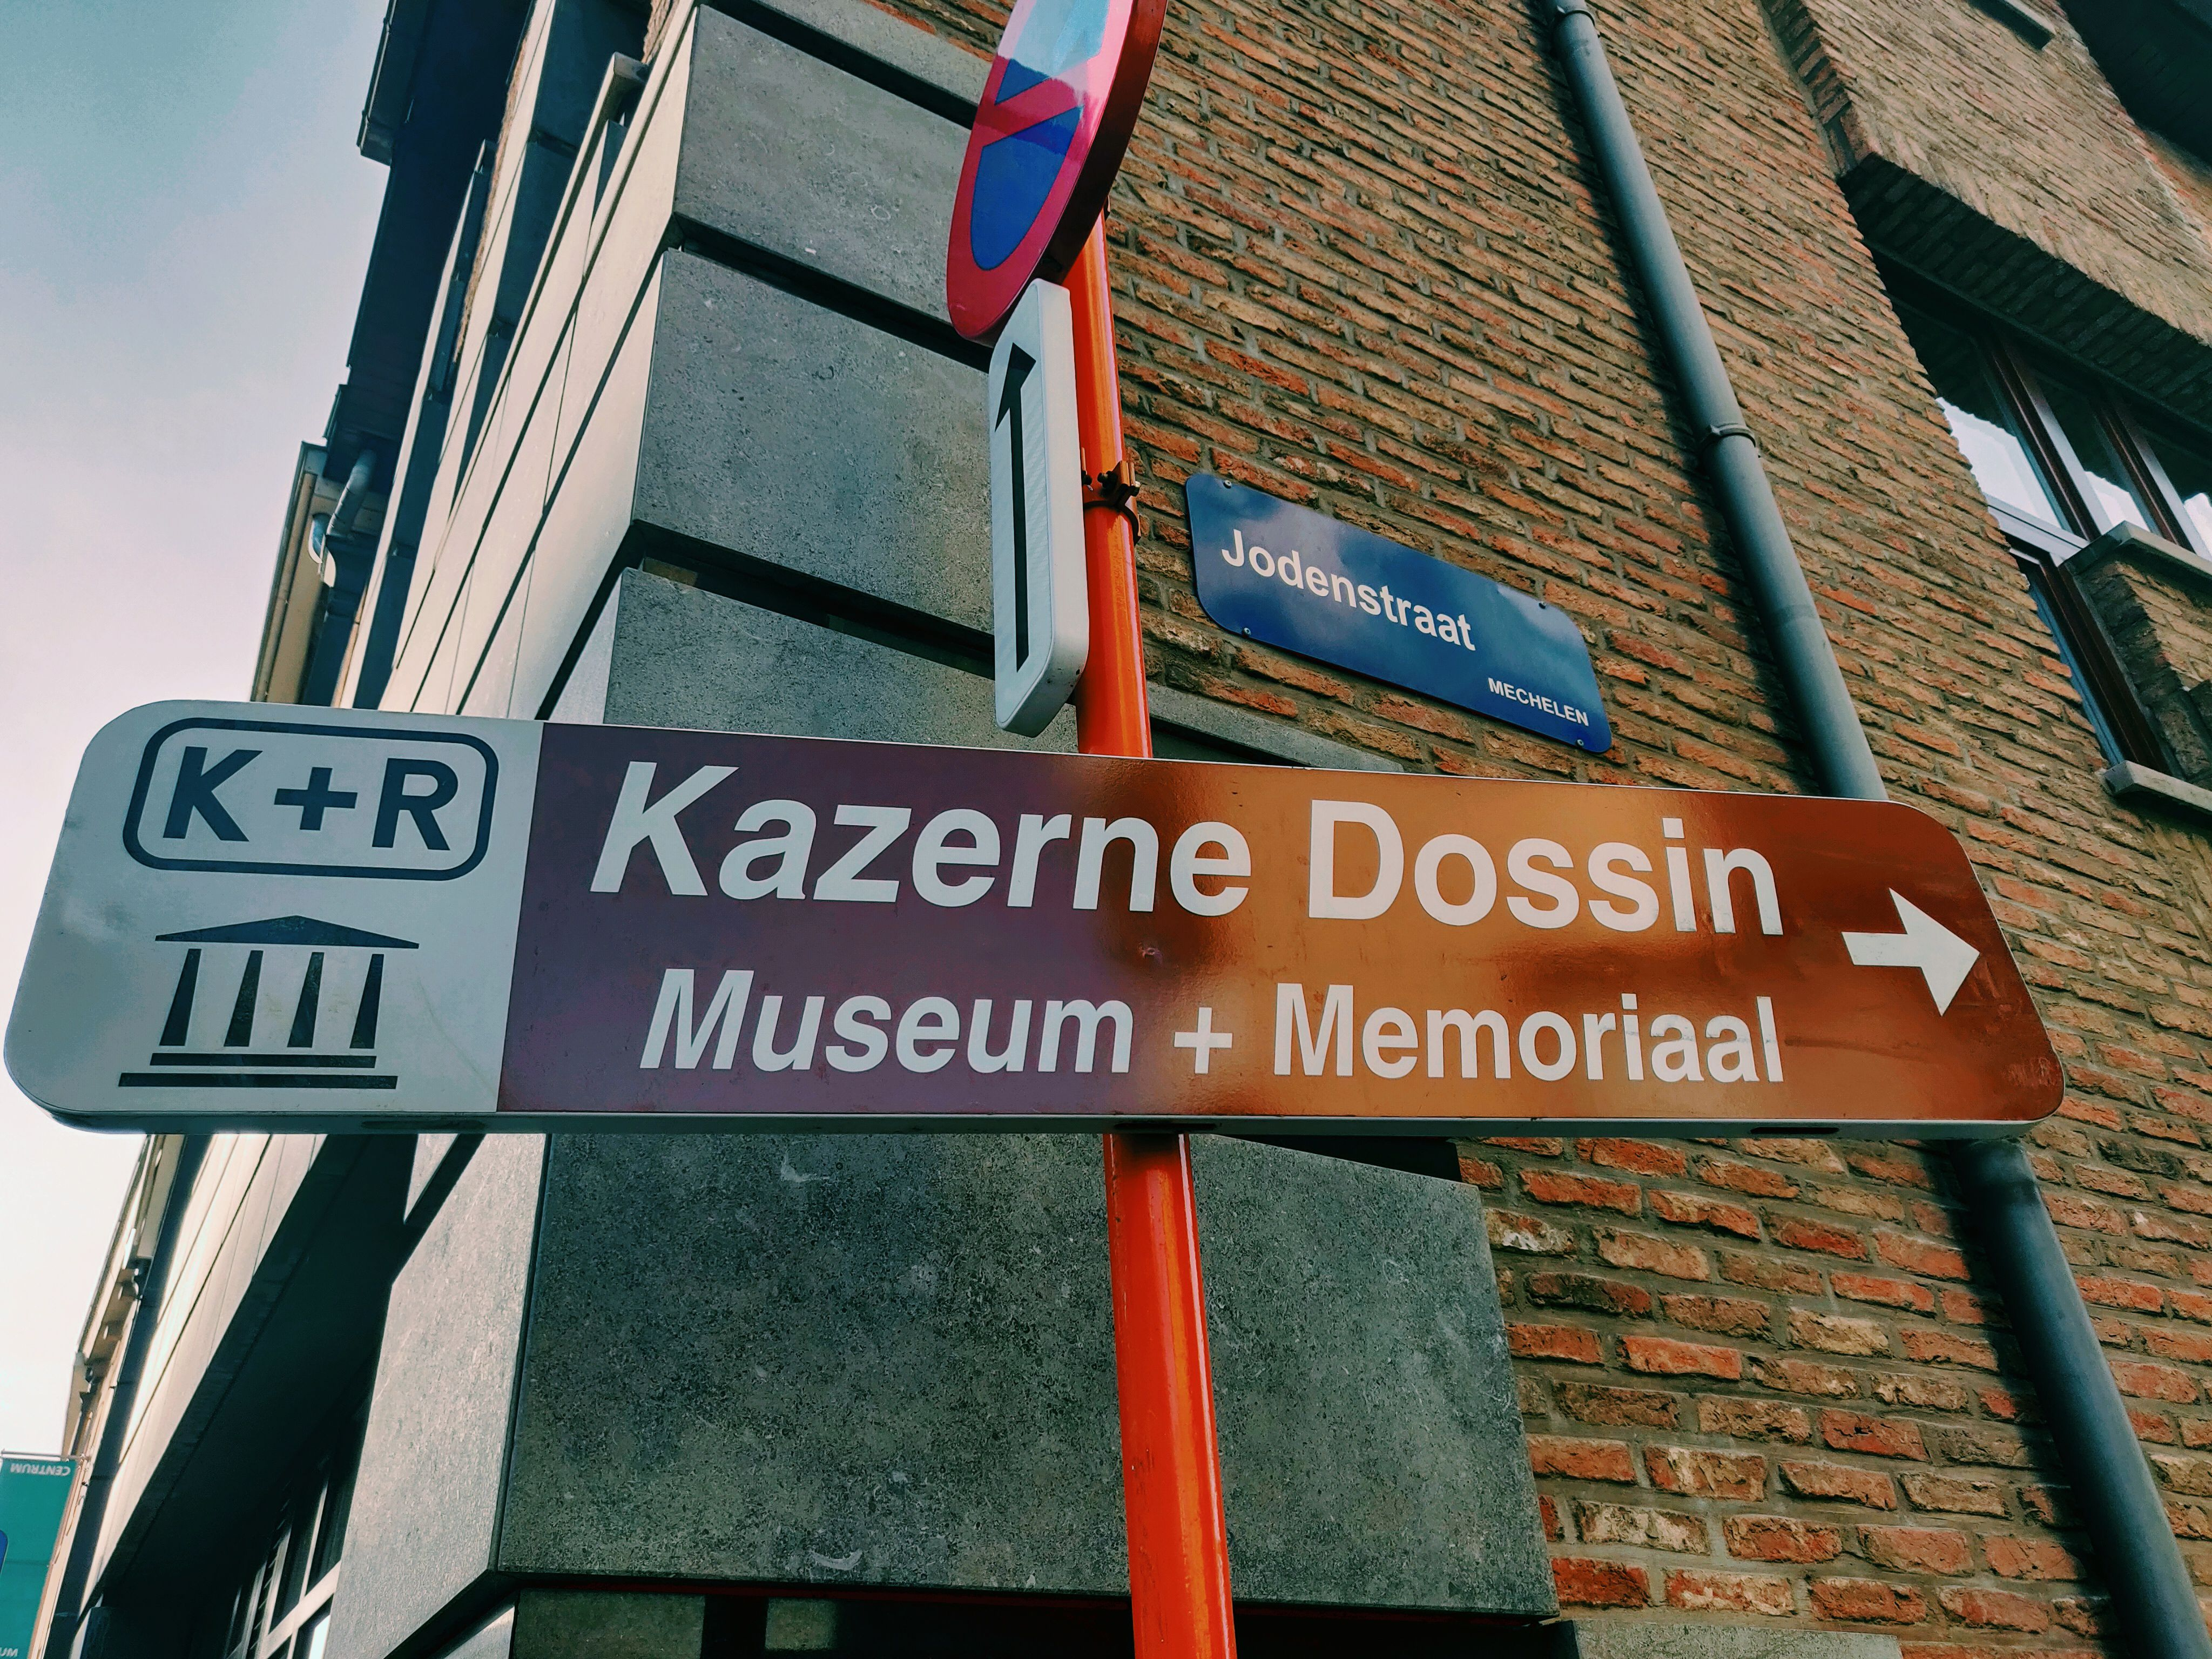 Houding Raad van Bestuur Kazerne Dossin is onrustwekkkend